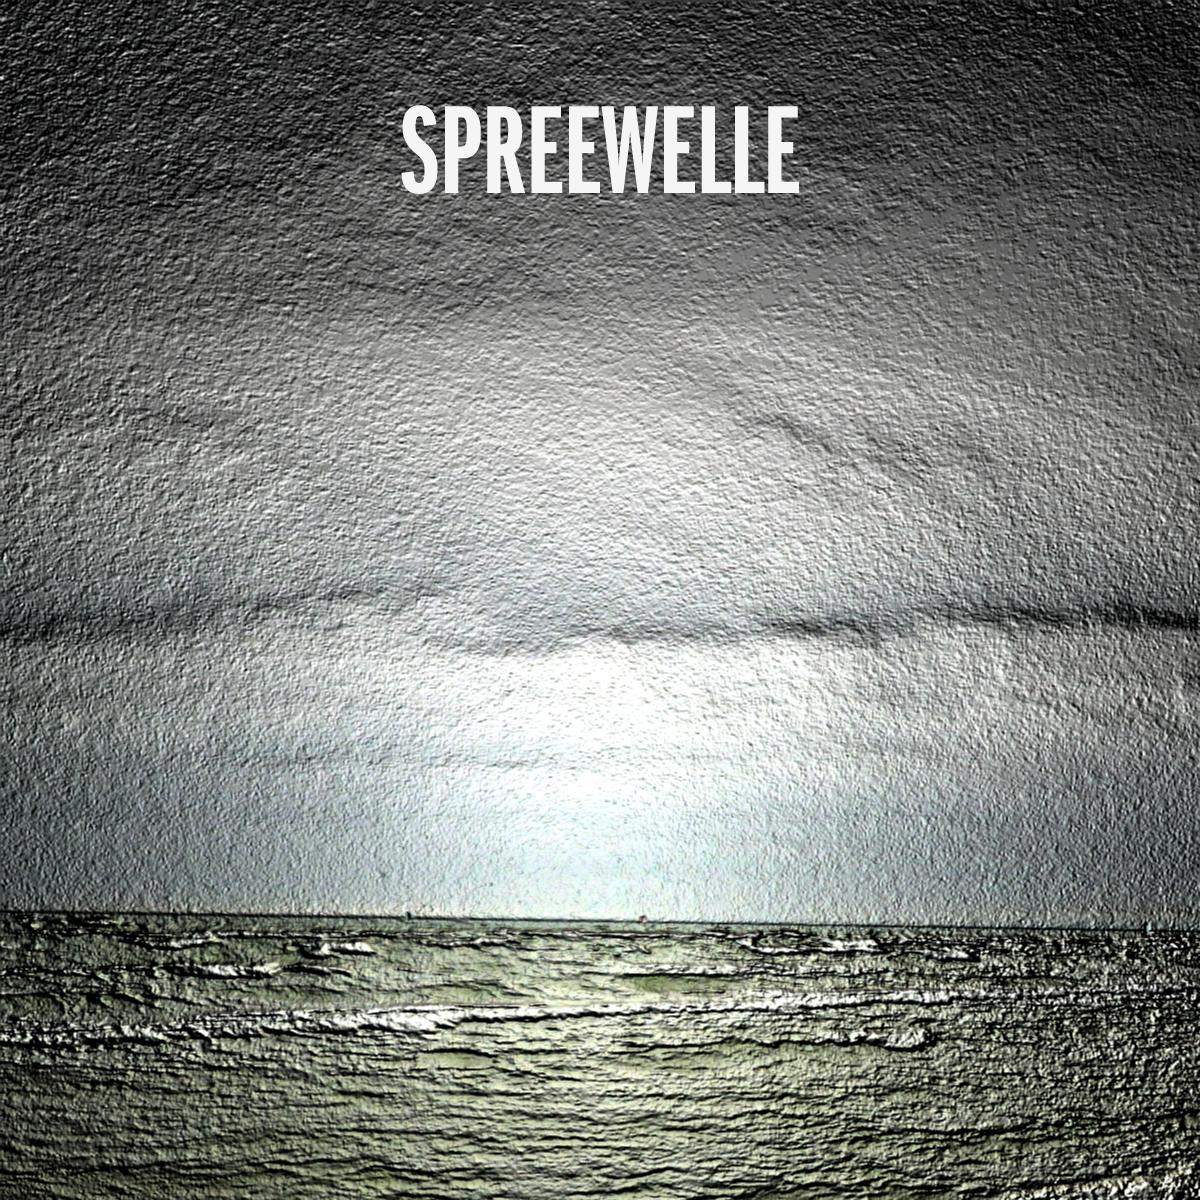 Cover-Spreewelle-74-01